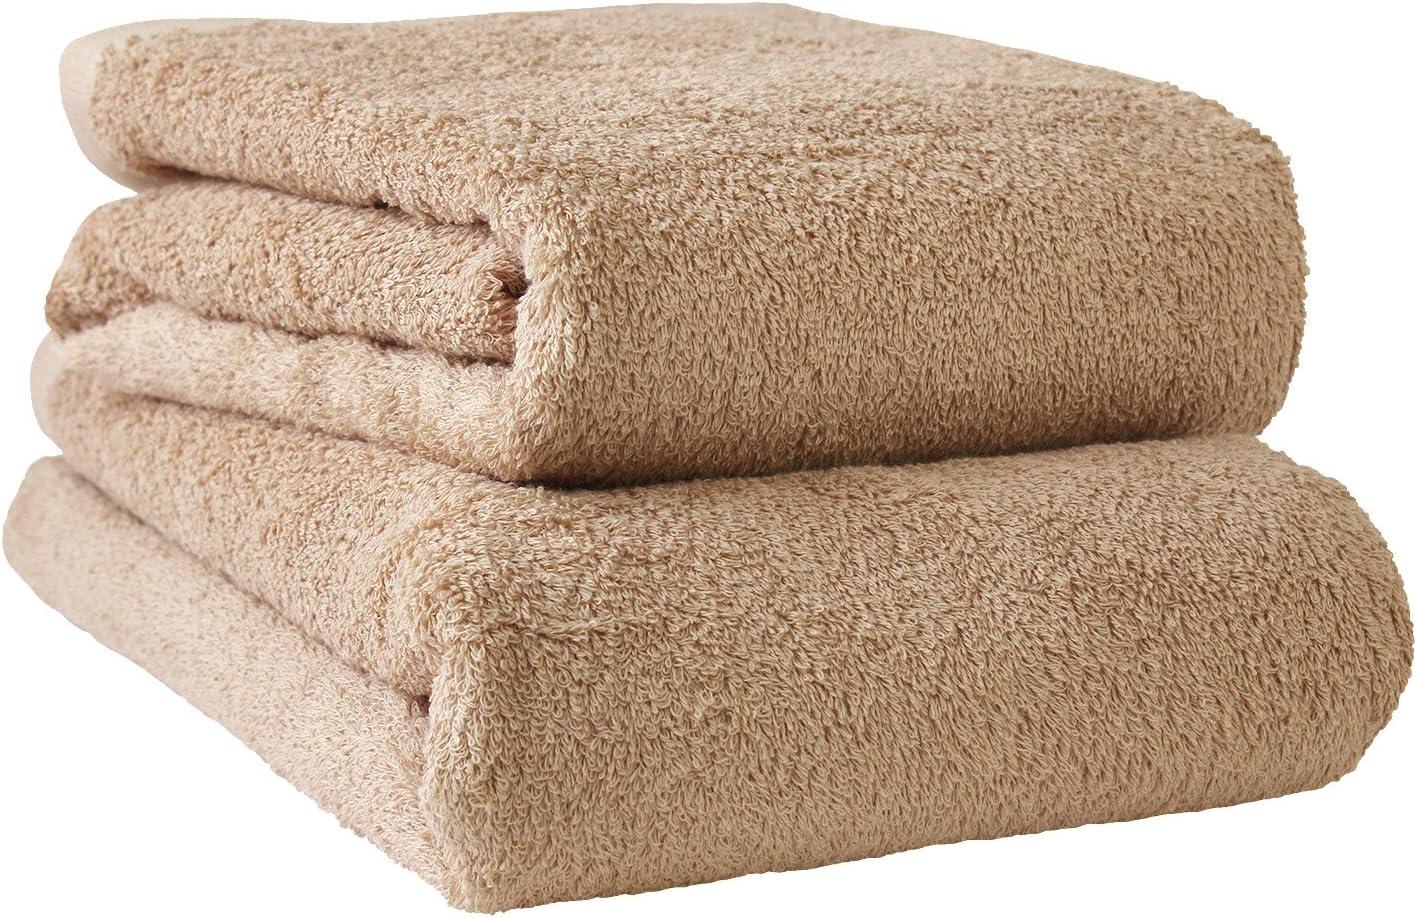 hiorie Japan Towels - 4 Set Max 41% OFF 23.6x51.1 Mocha store Bath Piece